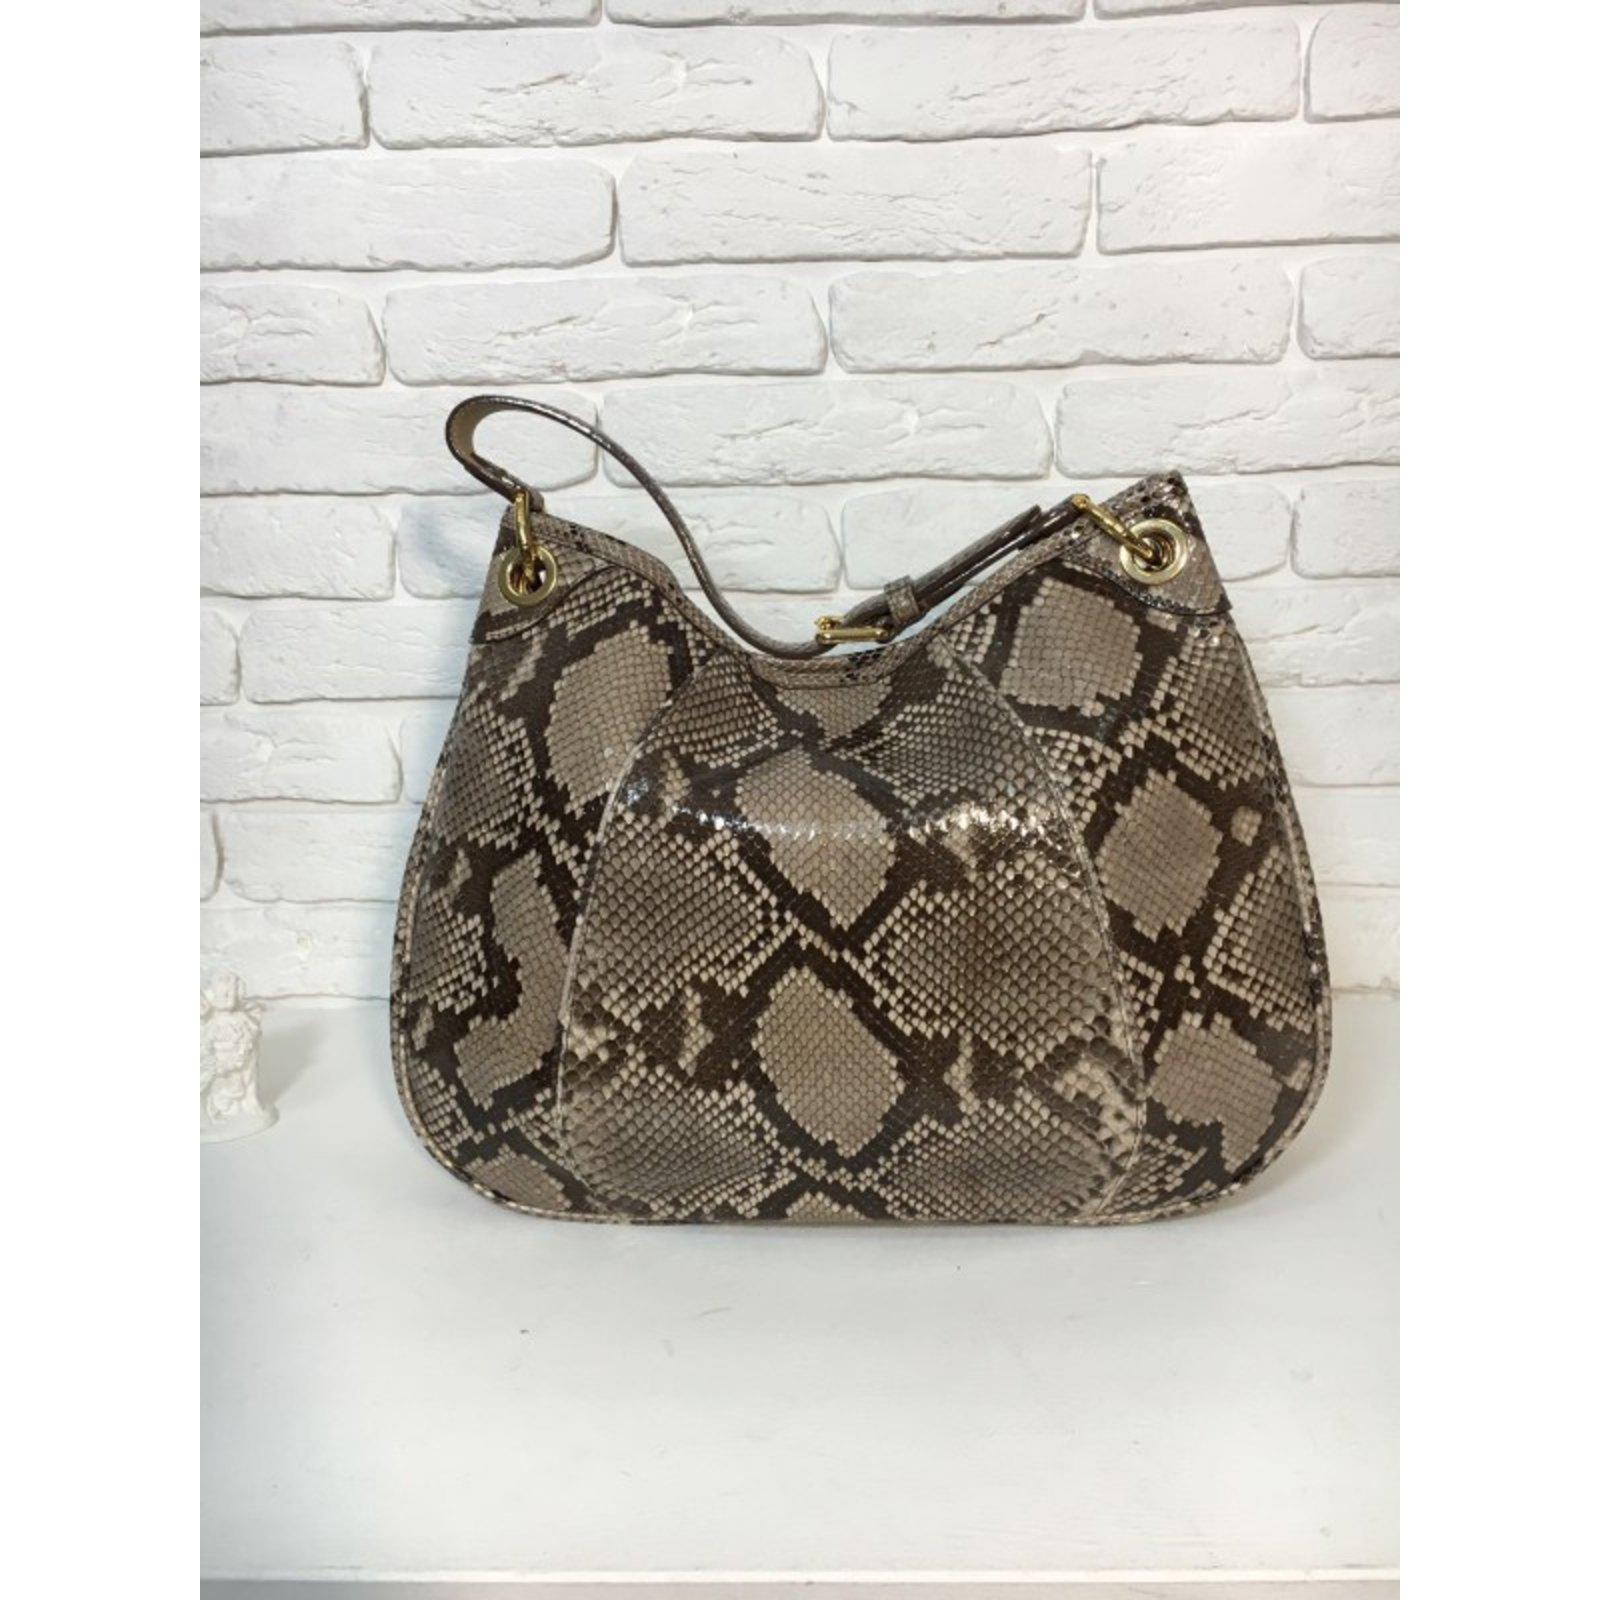 a2388a1ec100 Louis Vuitton Limited Edition Python Galliera Smeralda GM Handbags Exotic  leather Python print ref.34142 - Joli Closet